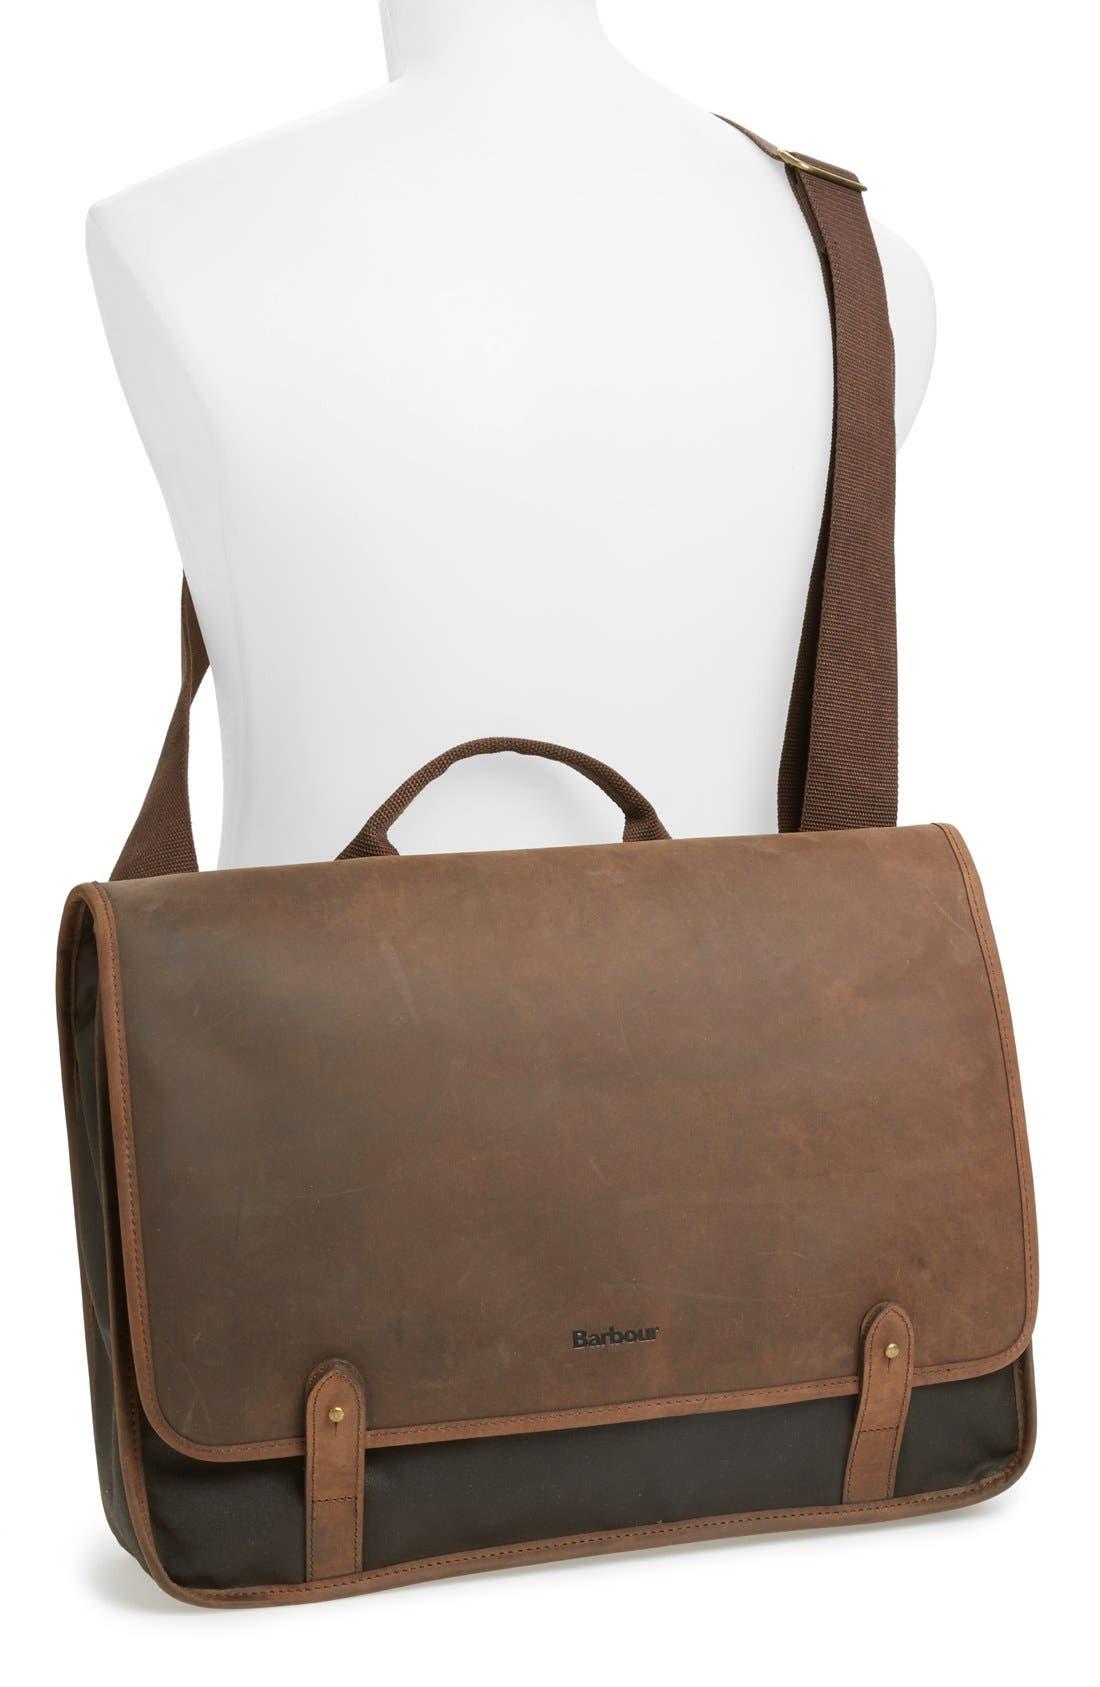 BARBOUR,                             Waxed Canvas & Leather Messenger Bag,                             Alternate thumbnail 2, color,                             340